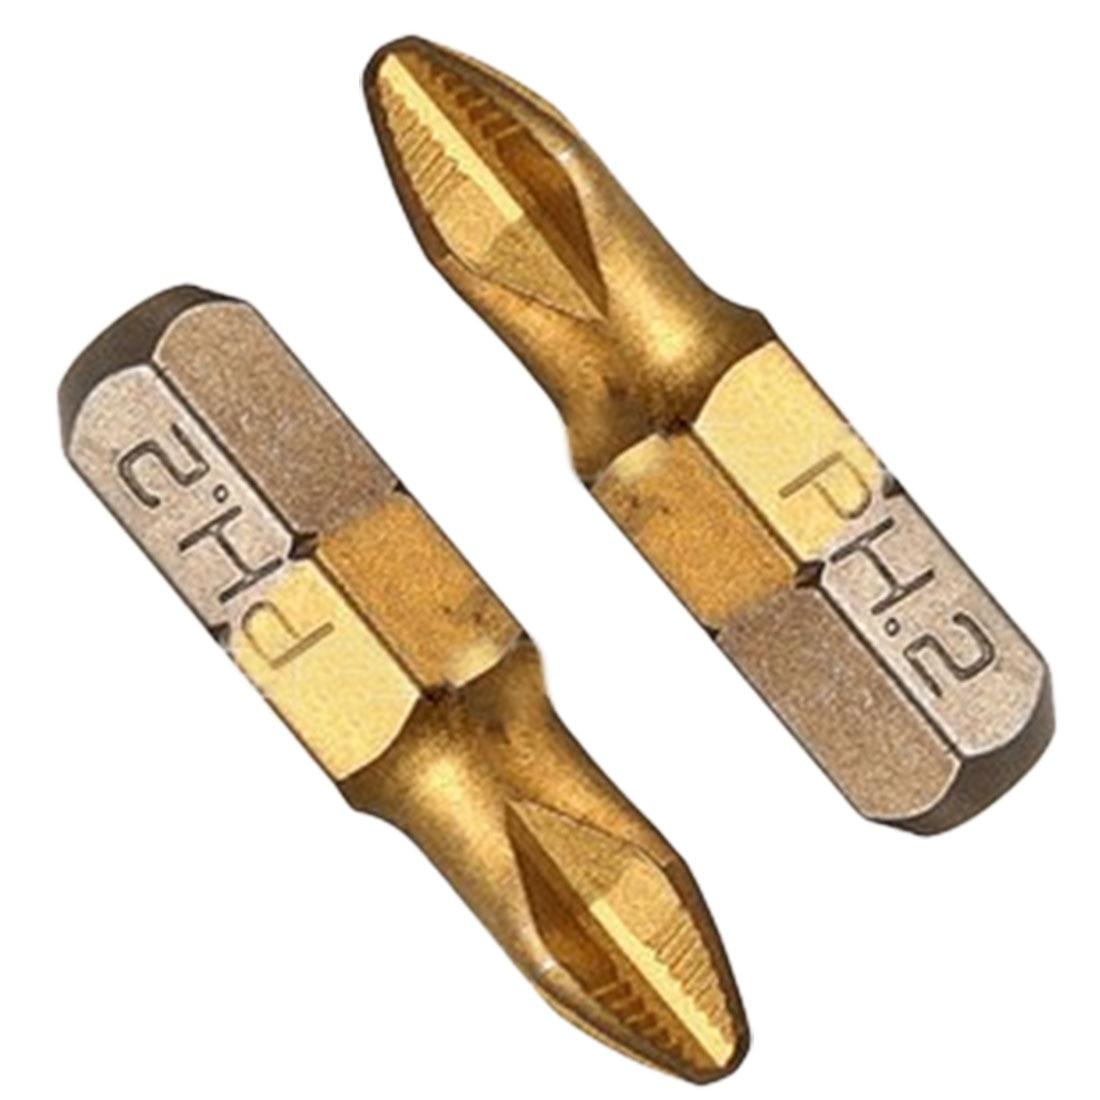 Professional 10pc/set Titanium Coated Cross Magnetic Screwdriver Bits